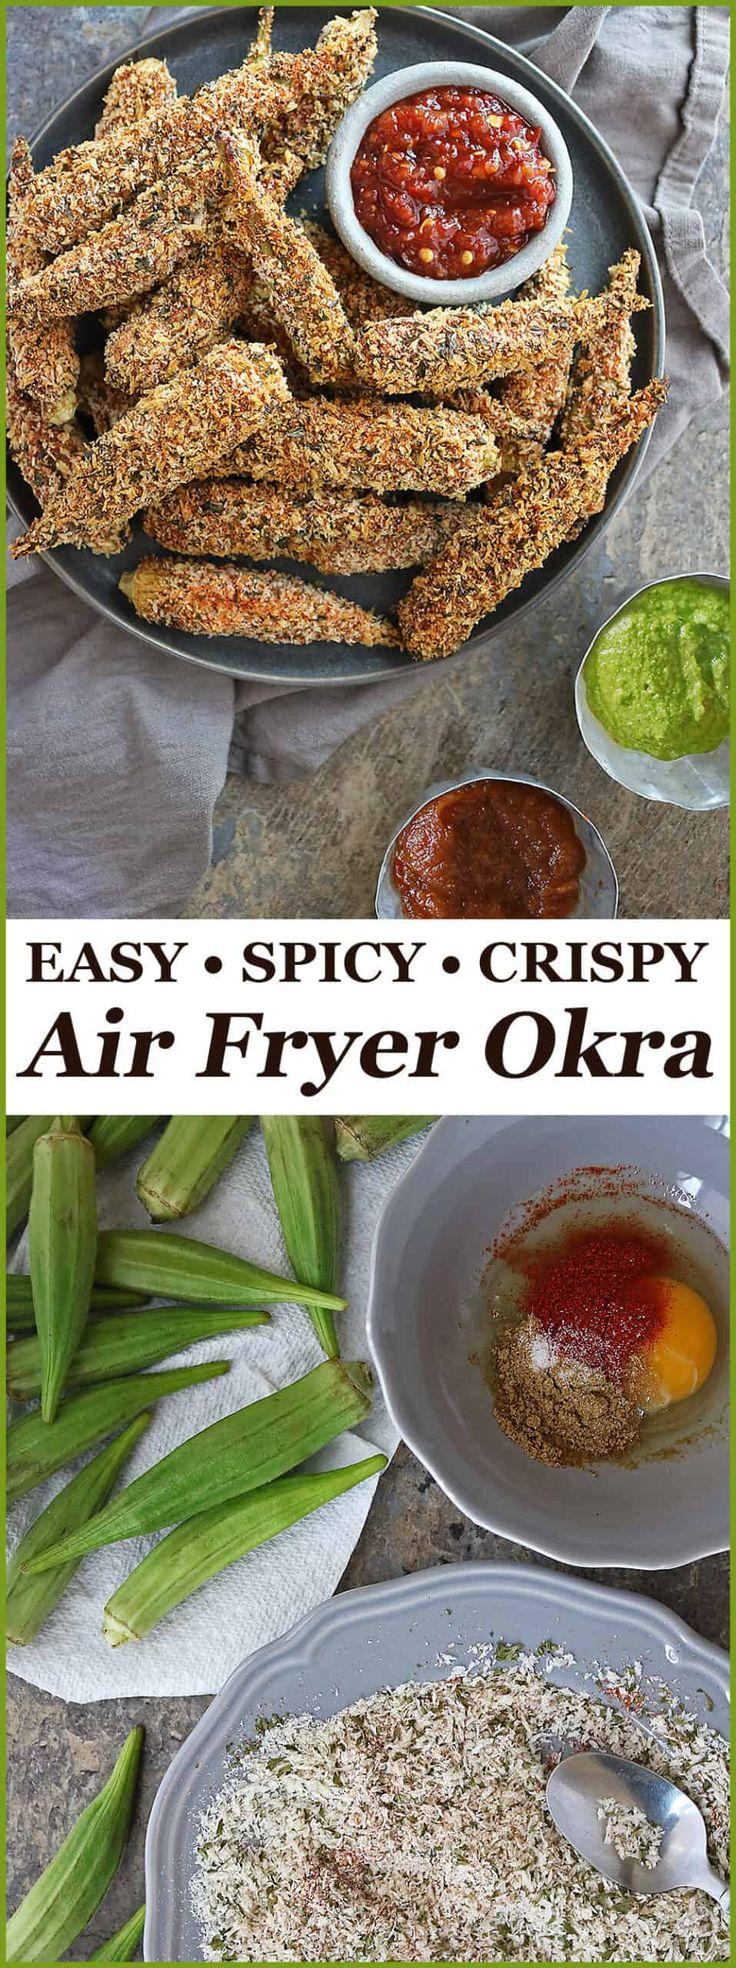 Crispy Spicy Air Fryer Okra Recipe Savory Spin Recipe